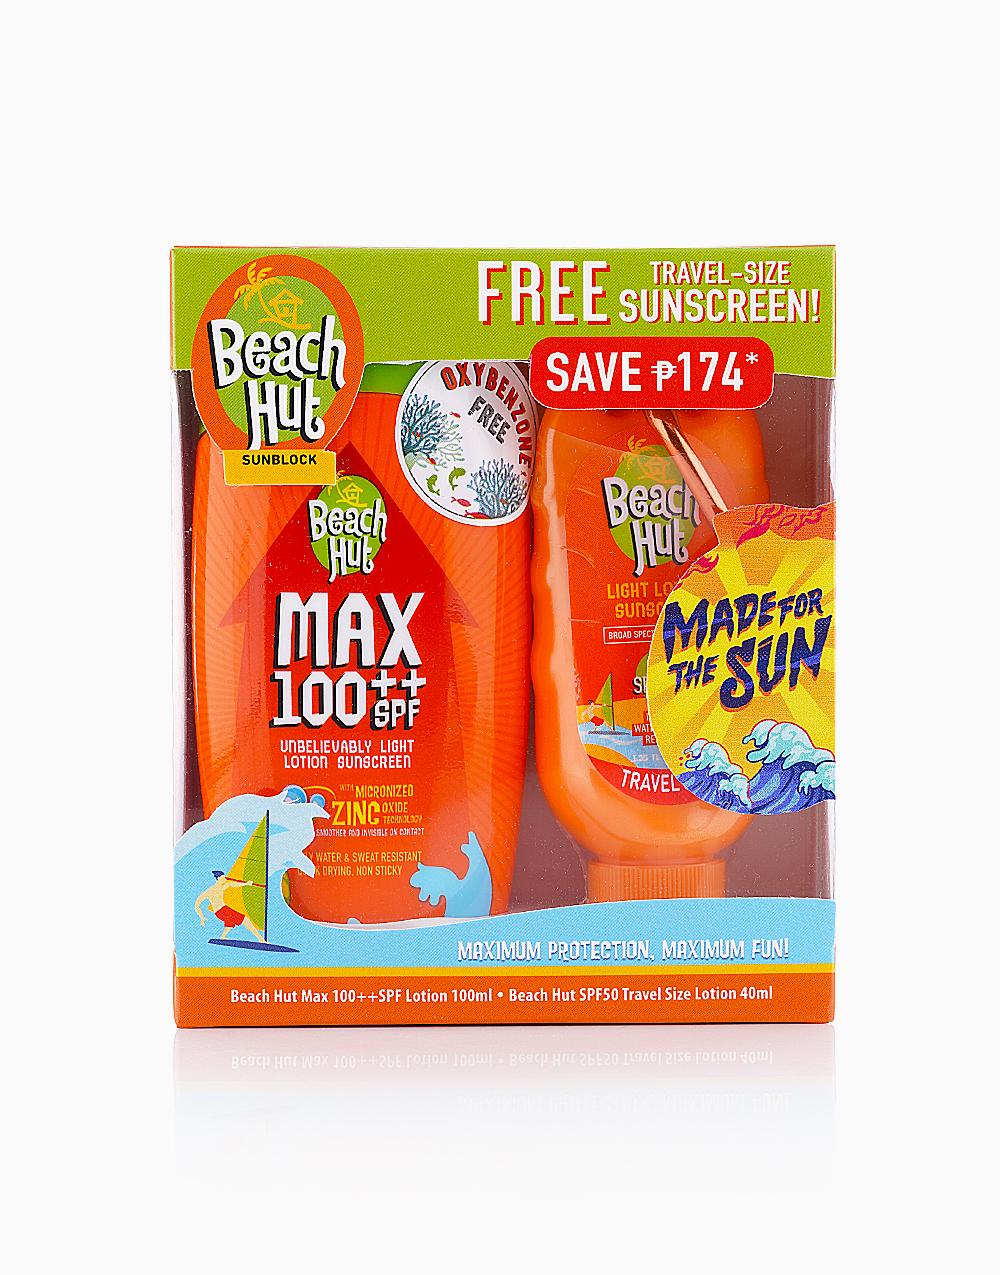 Beach Hut Max 100 Lotion (100ml) + Free SPF50 (40ml) with Carabiner by Beach Hut